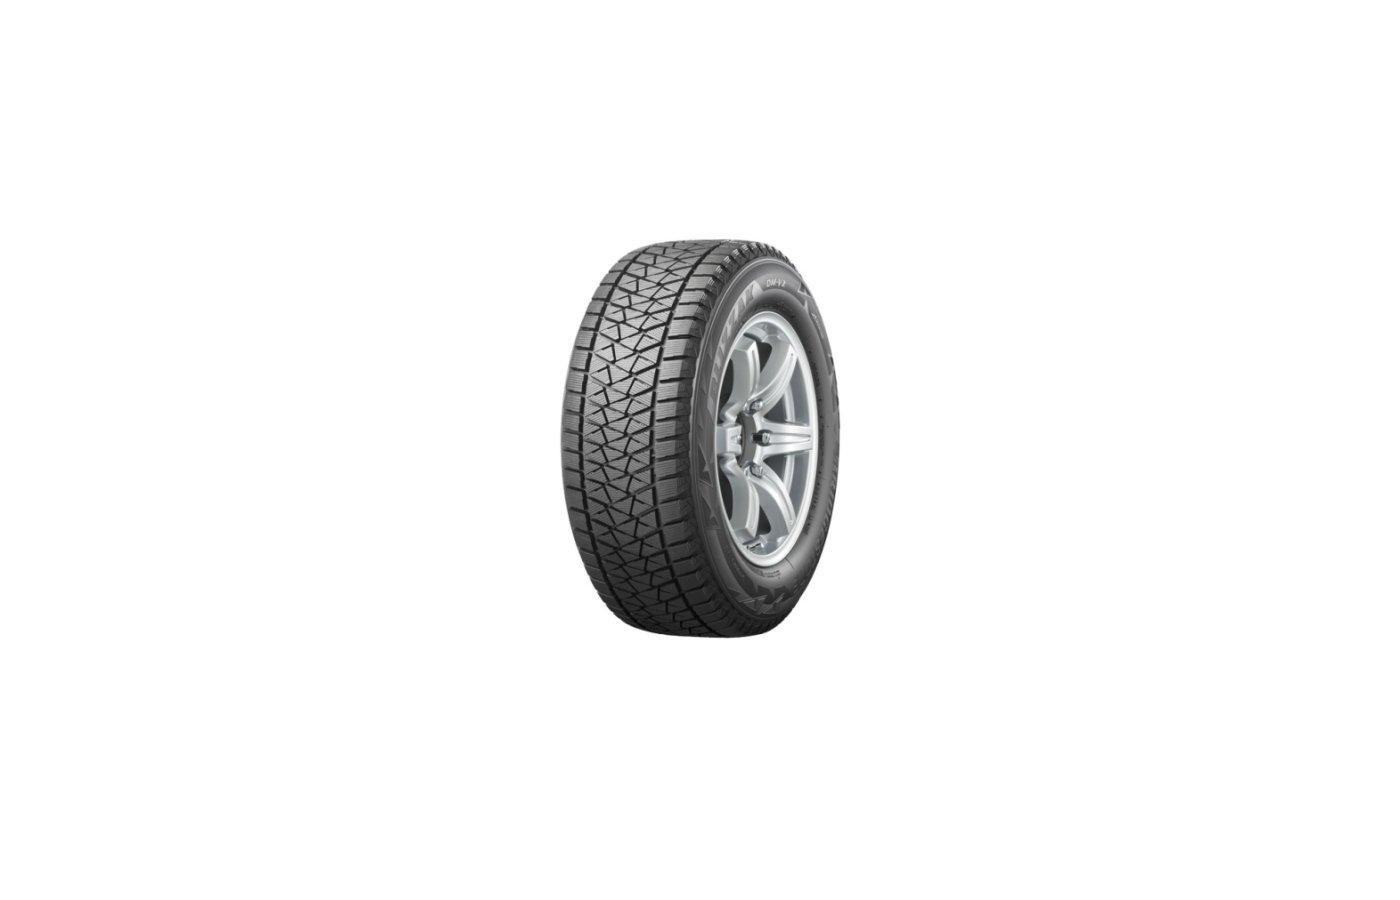 Шина Bridgestone Blizzak DM-V2 265/60 R18 TL 110R